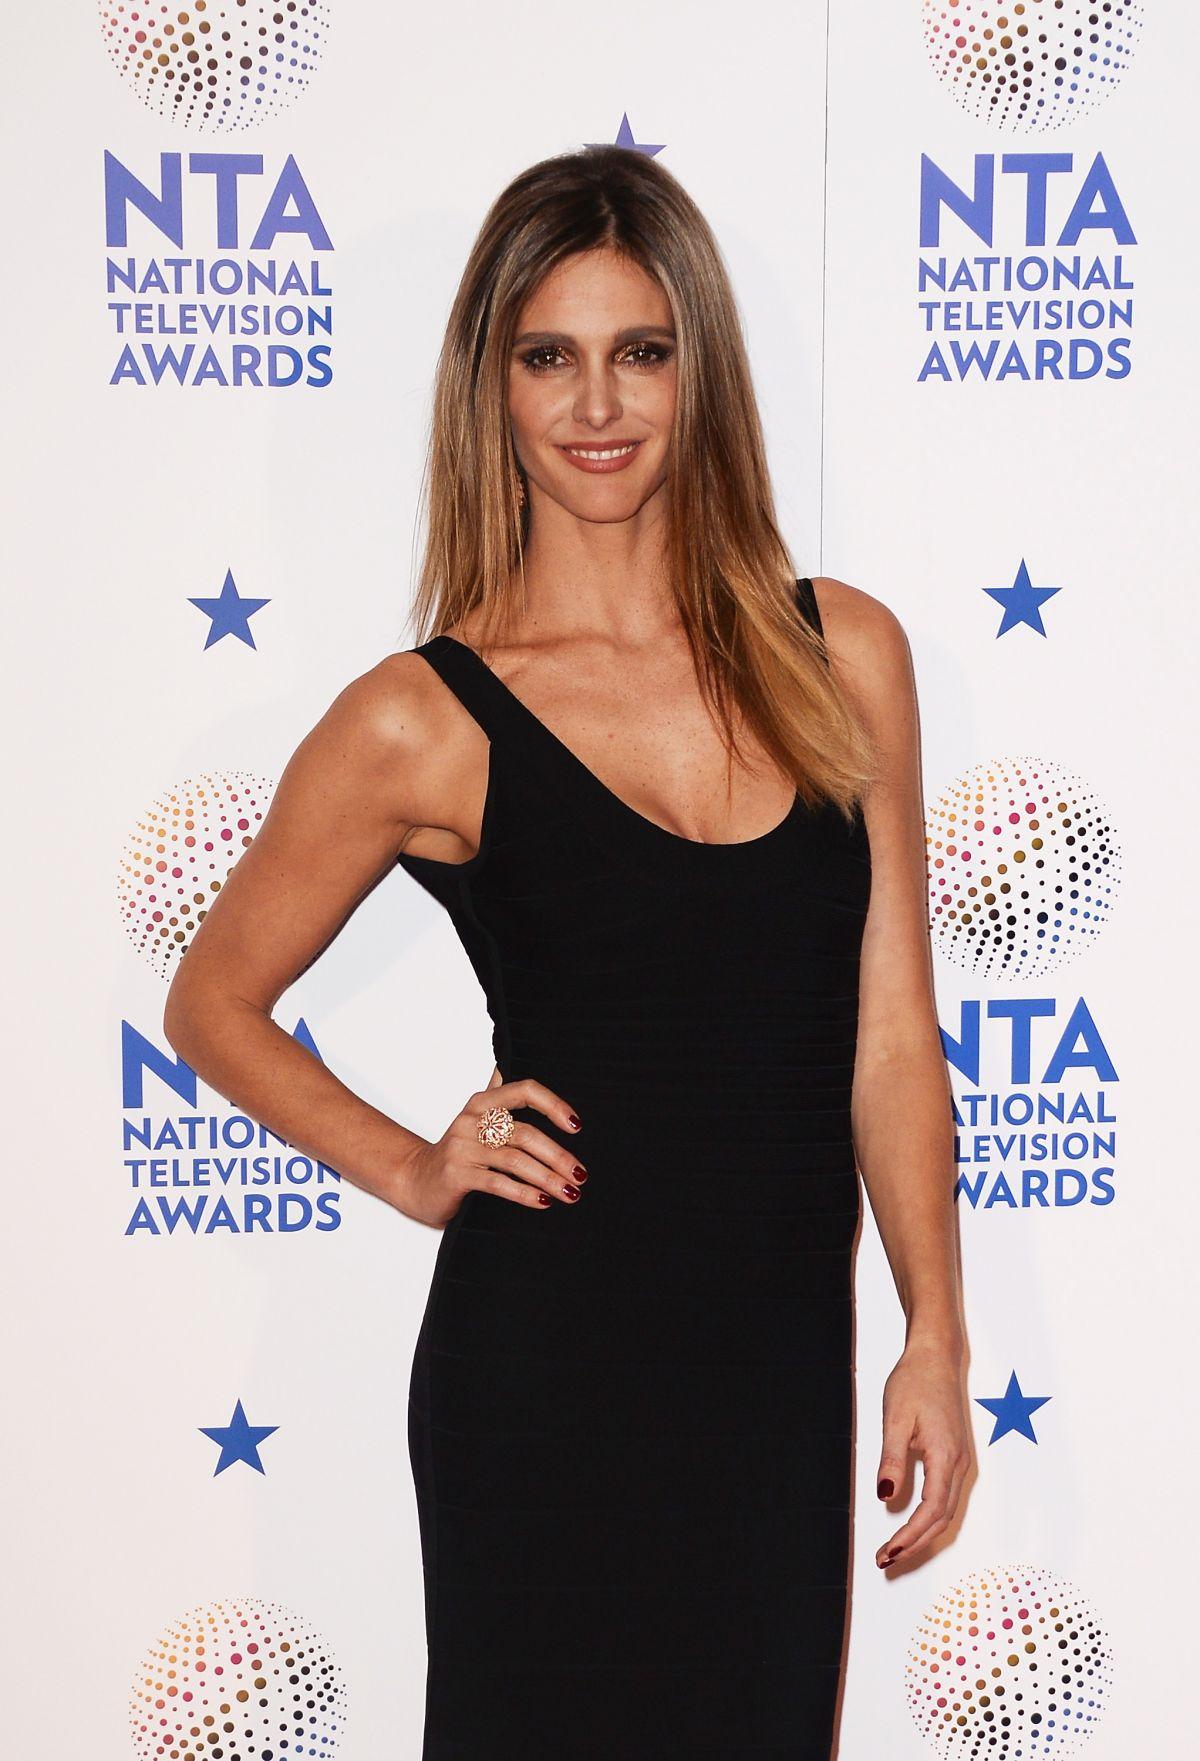 FERNANDA LIMA at 2014 National Television Awards in London